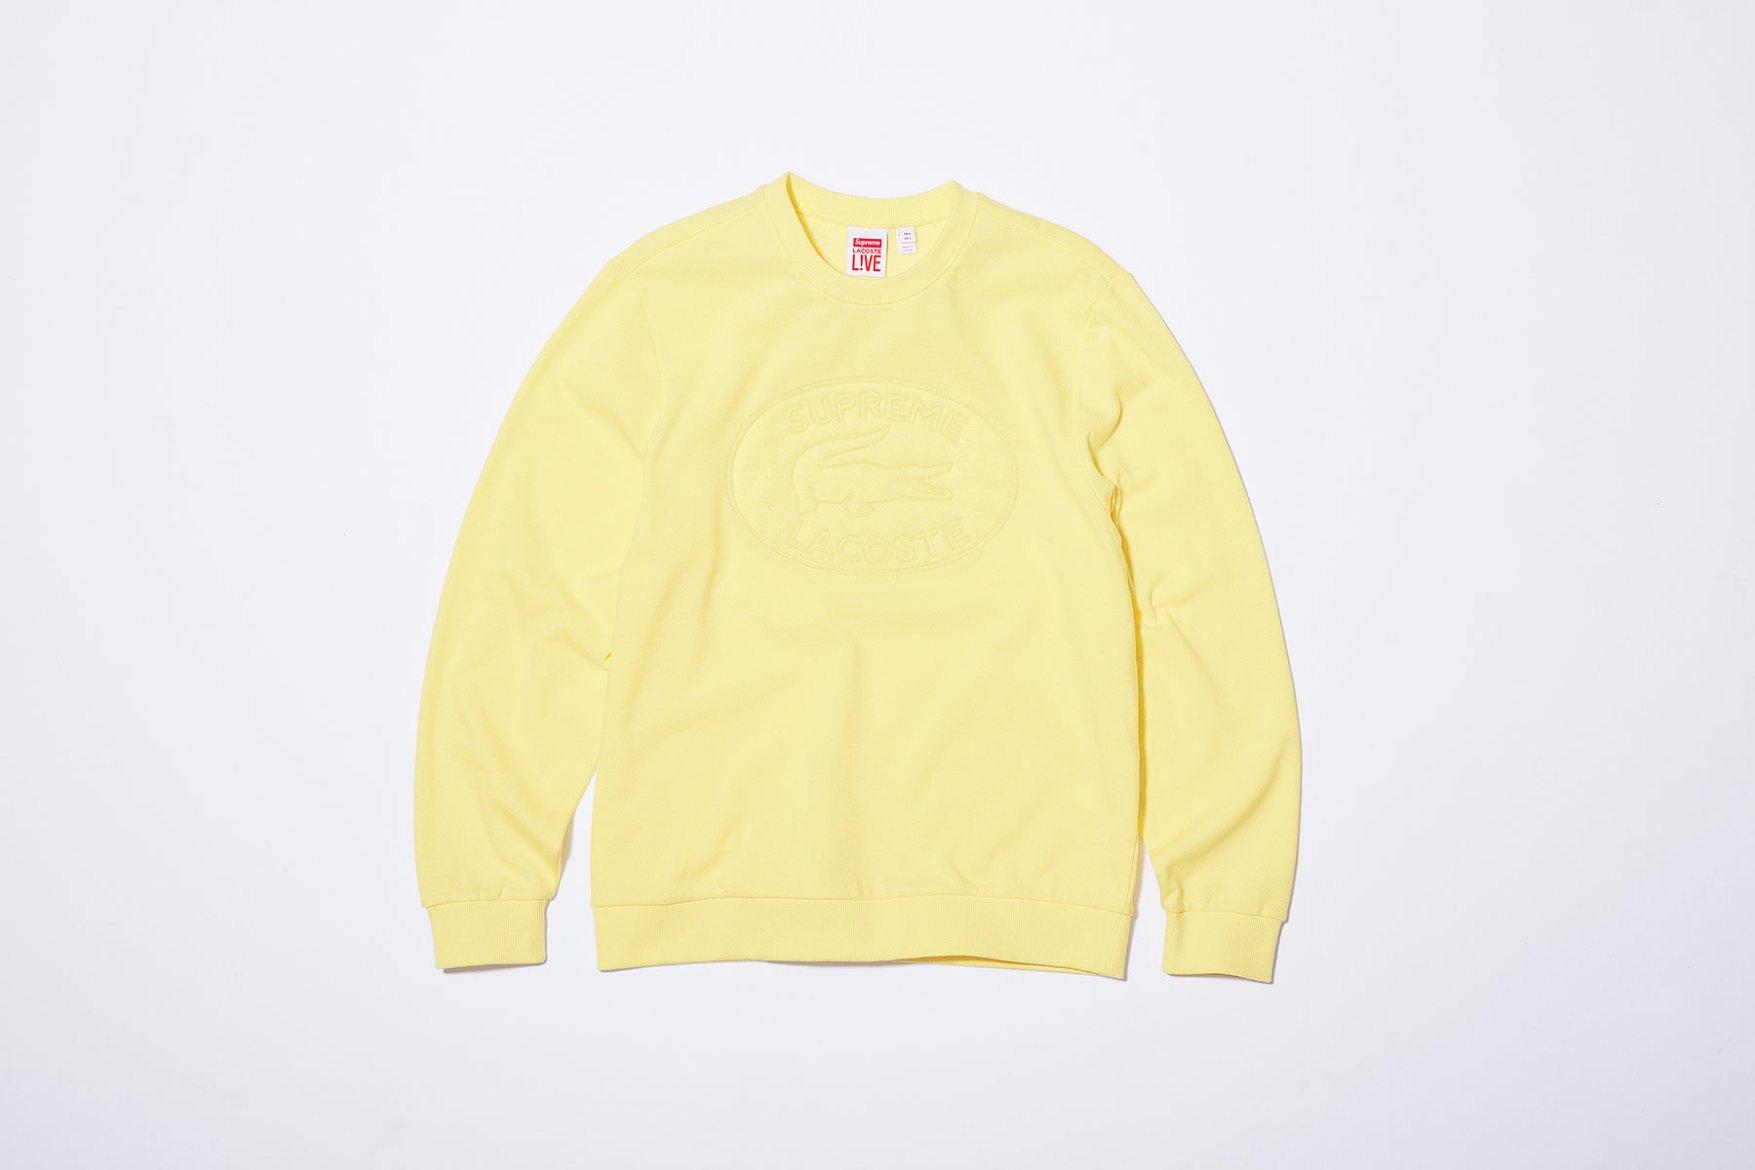 de8c14a630b1 lacoste-supreme-yellow-crewneck-2017-spring-summer-16 - The Cut